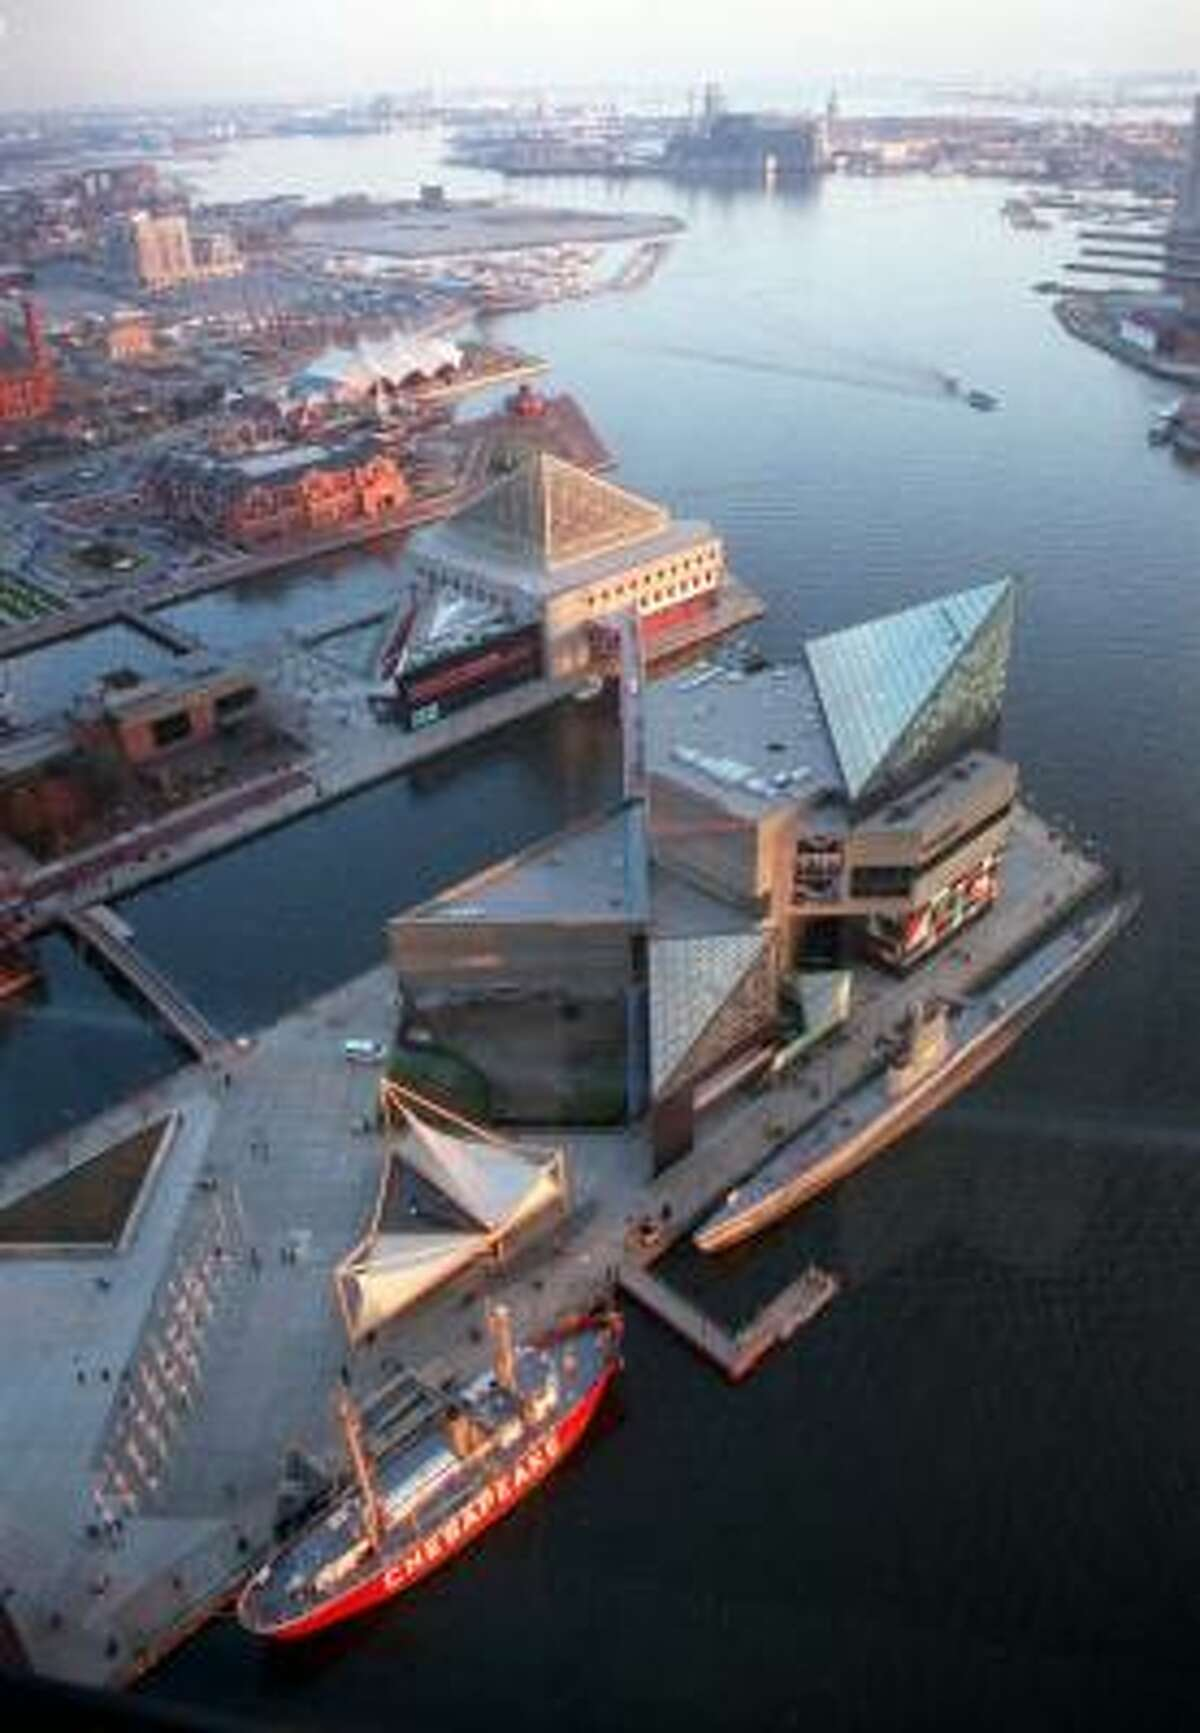 Visitors shouldn't skip Baltimore, according to ShermansTravel.com.